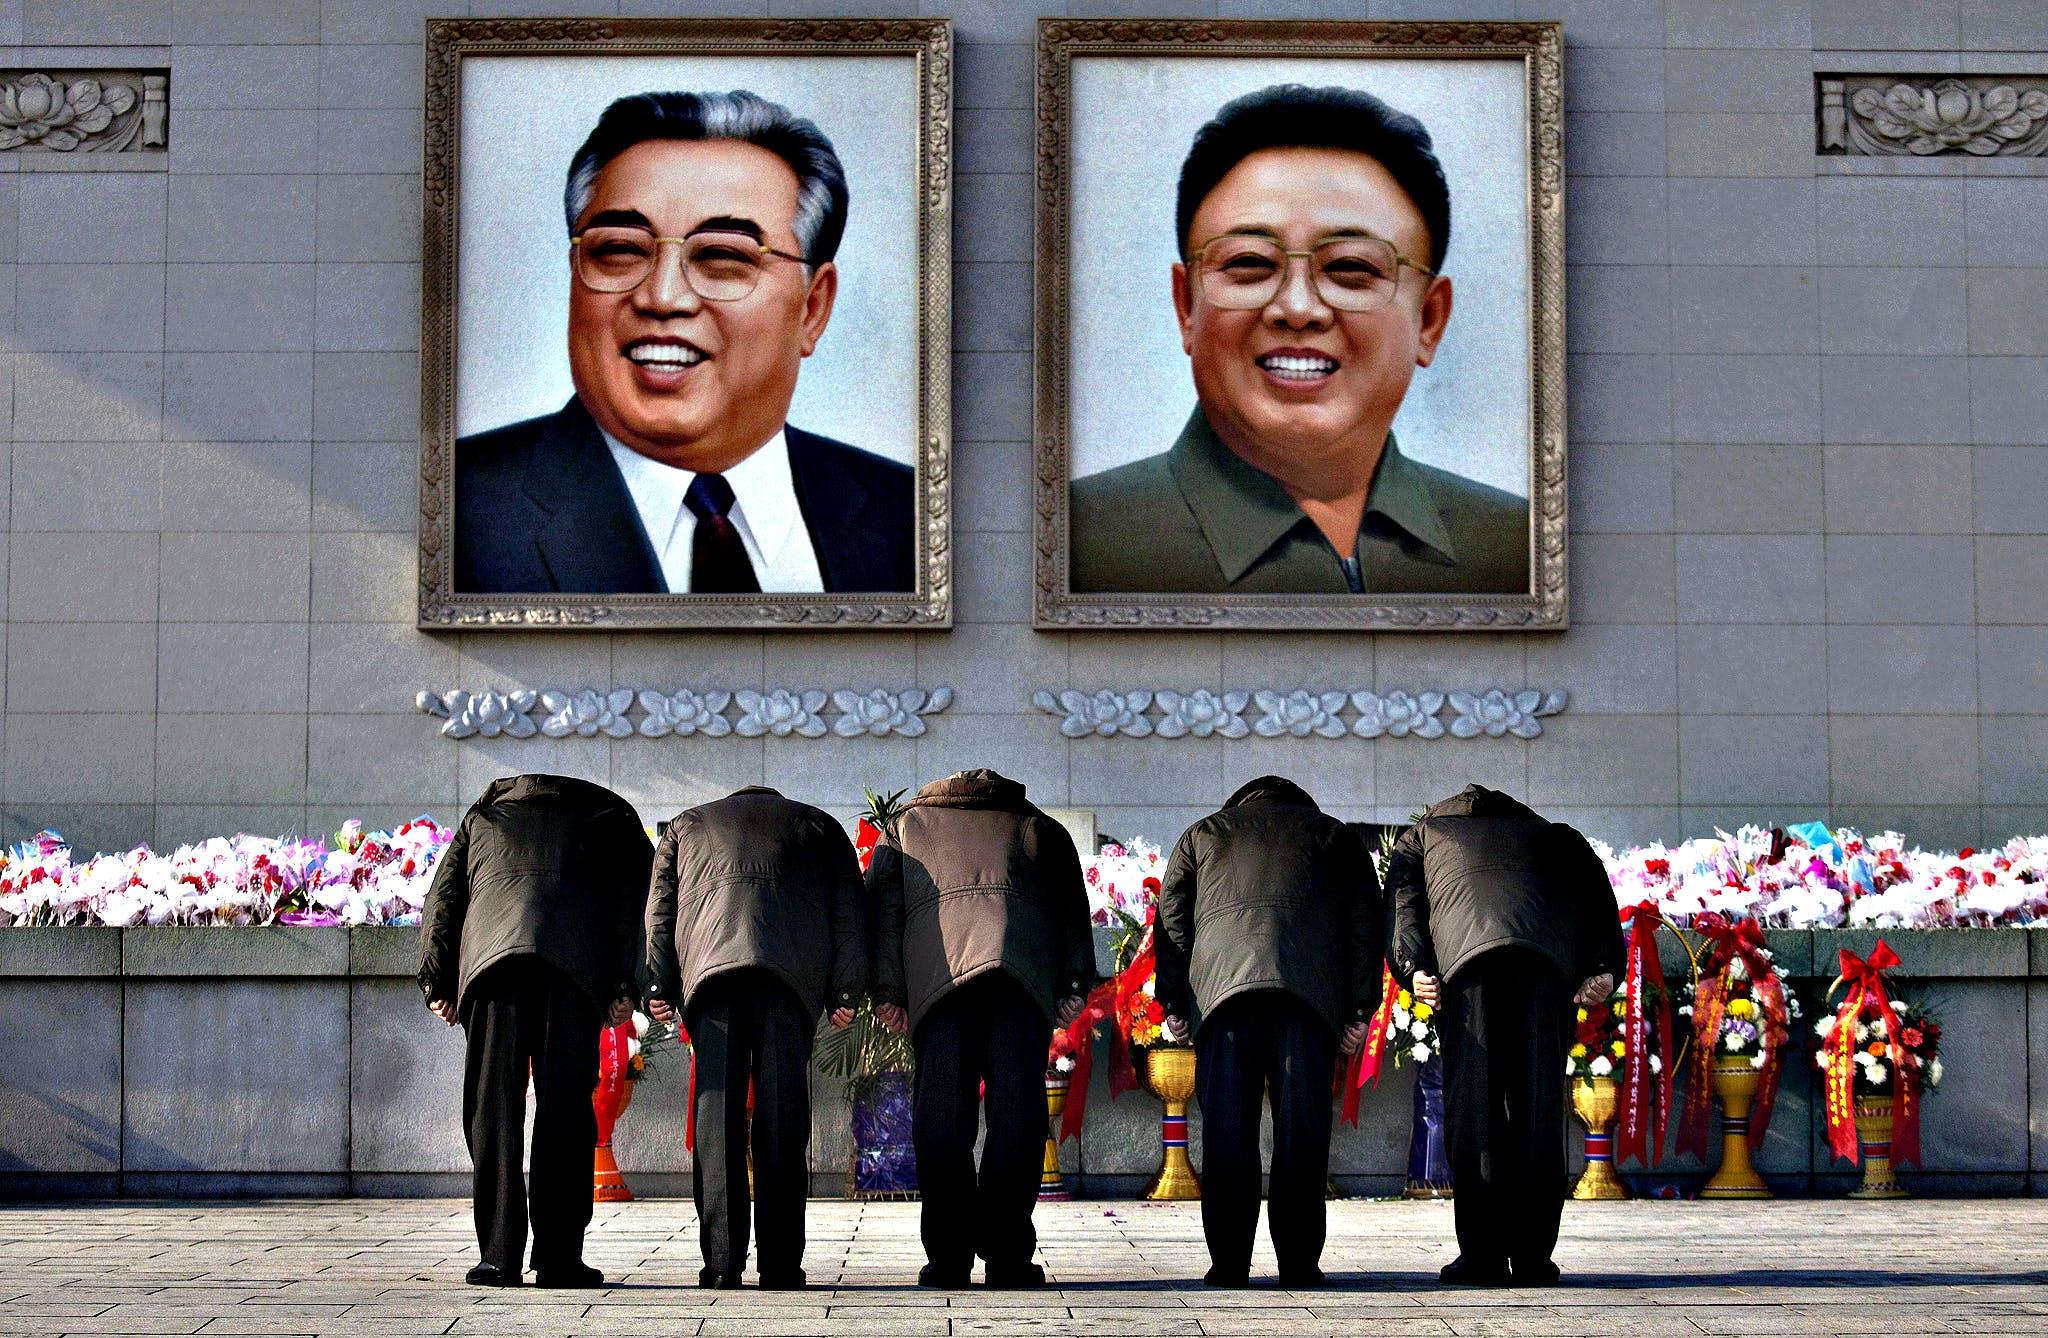 plotki o randkach koreańskie celne w Republice Dominikańskiej